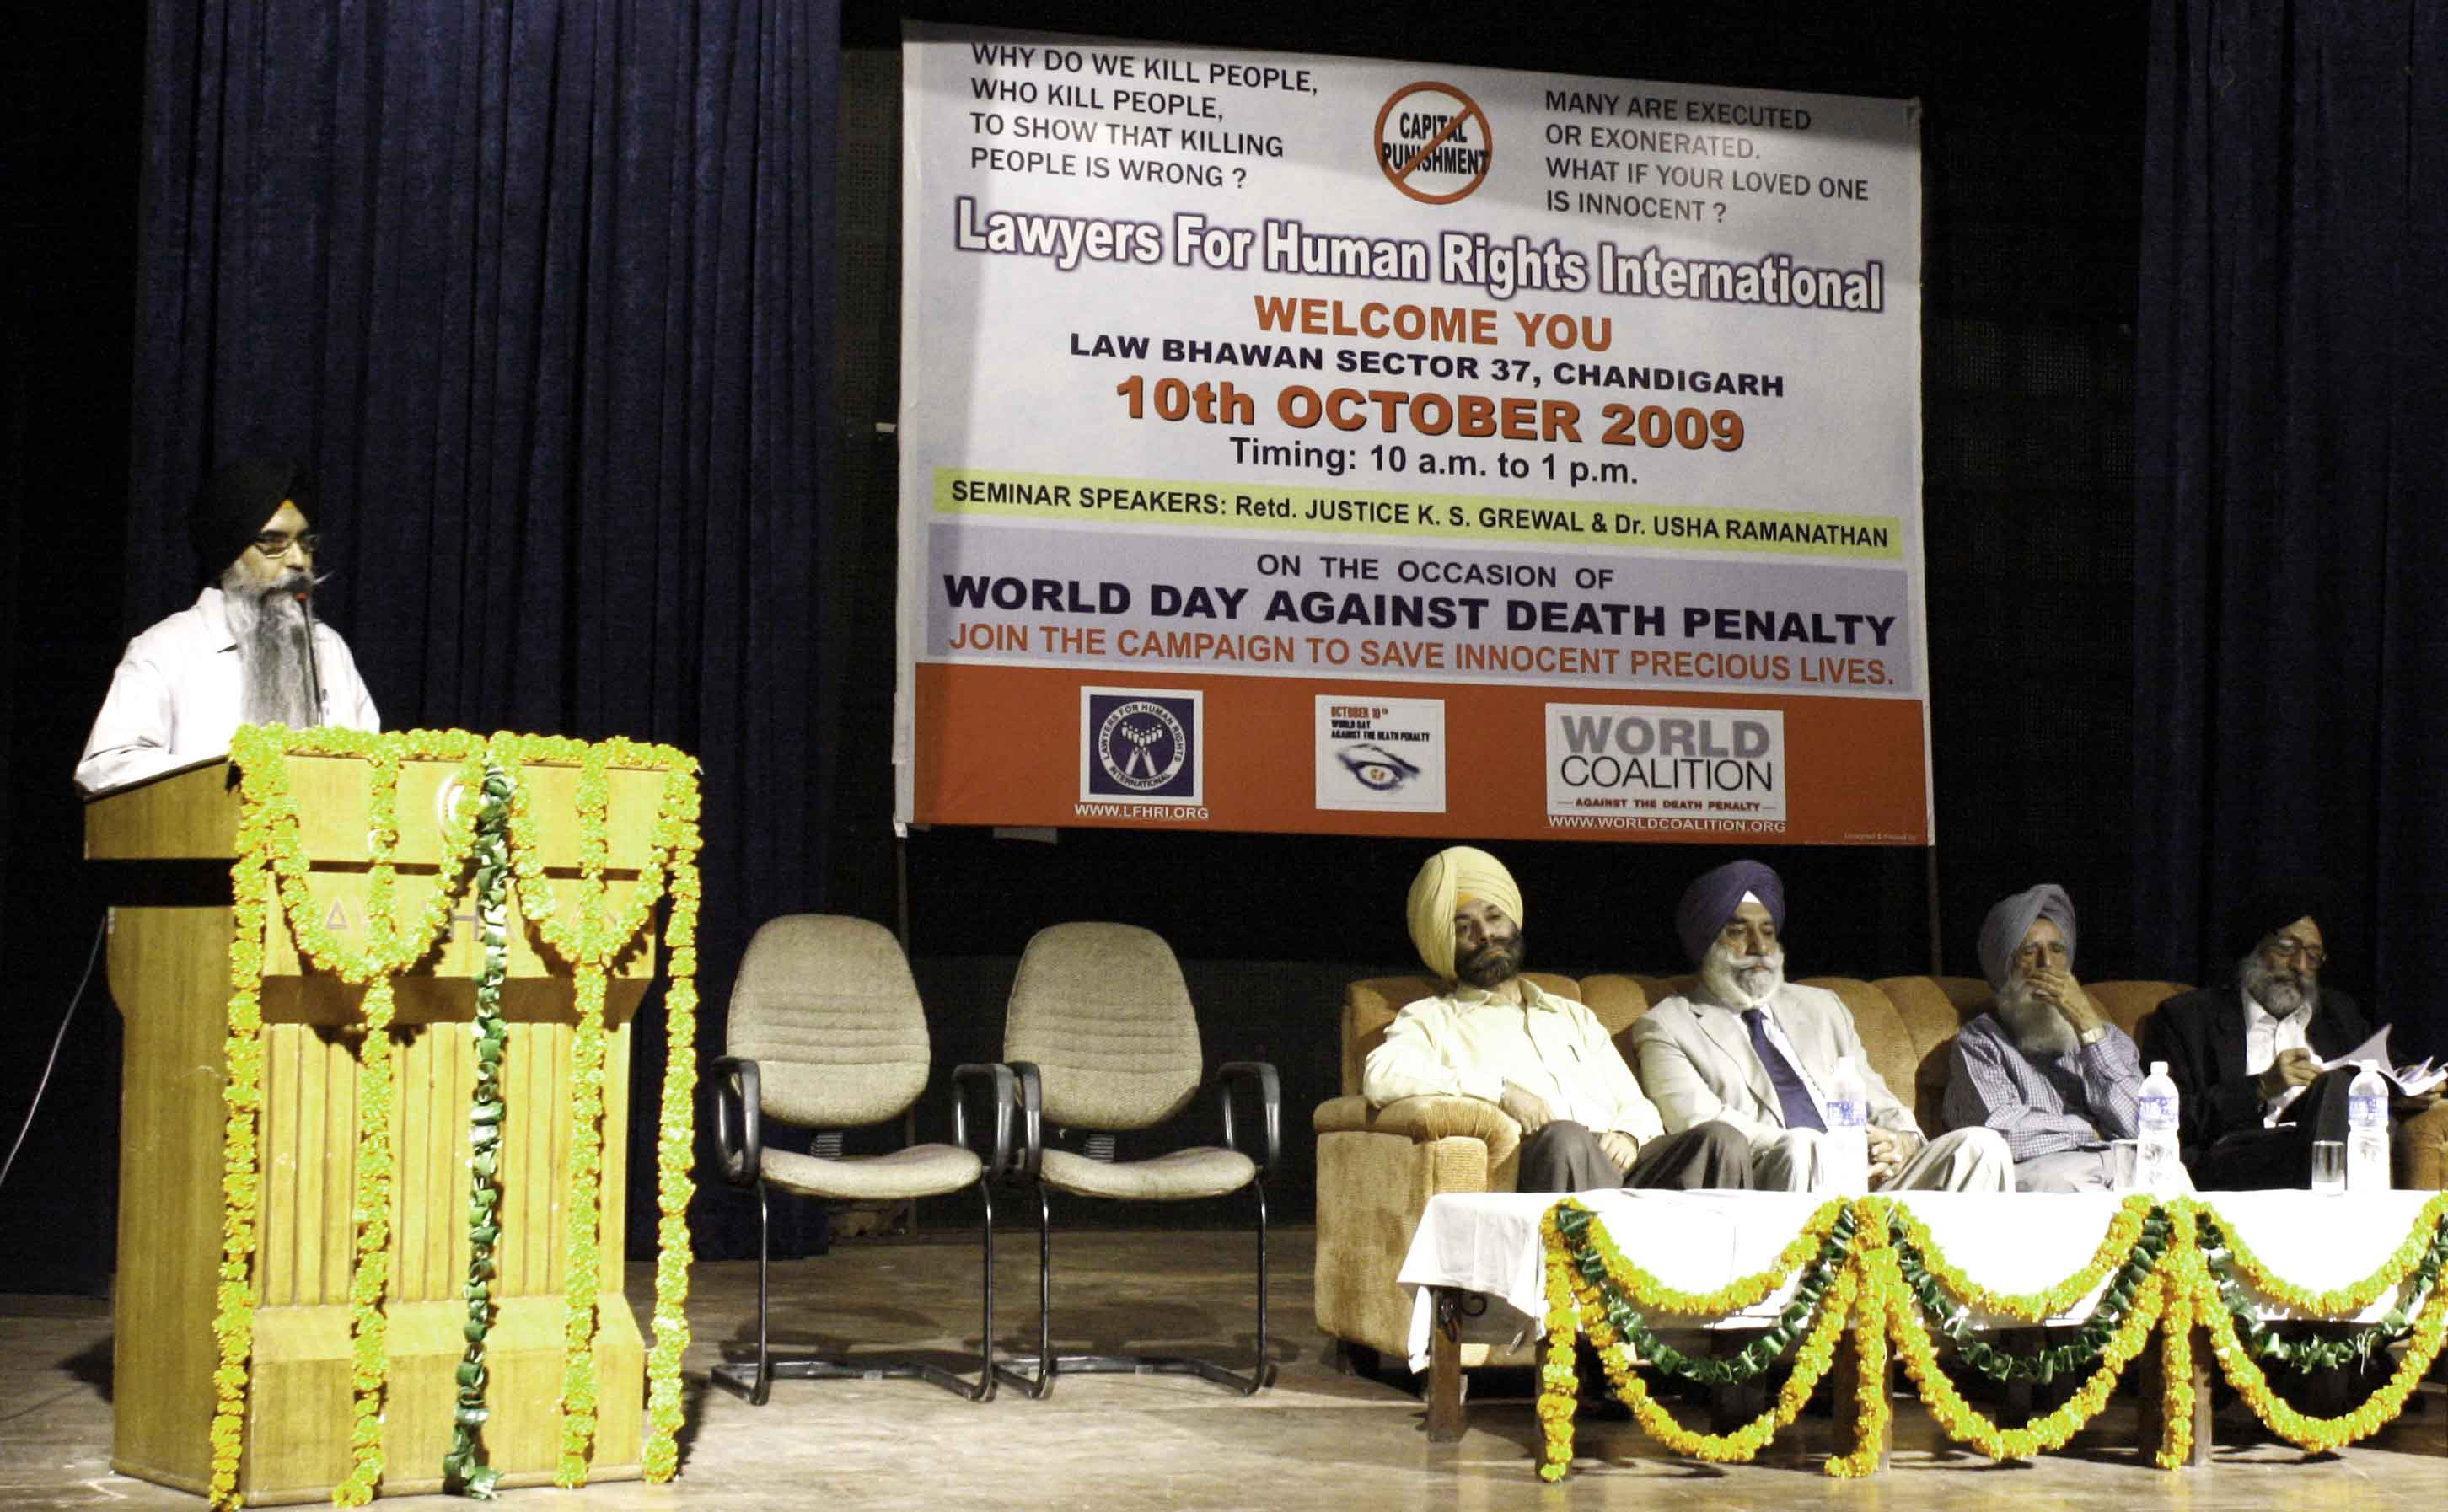 Navkiran Singh adressing in the seminar against death penalty